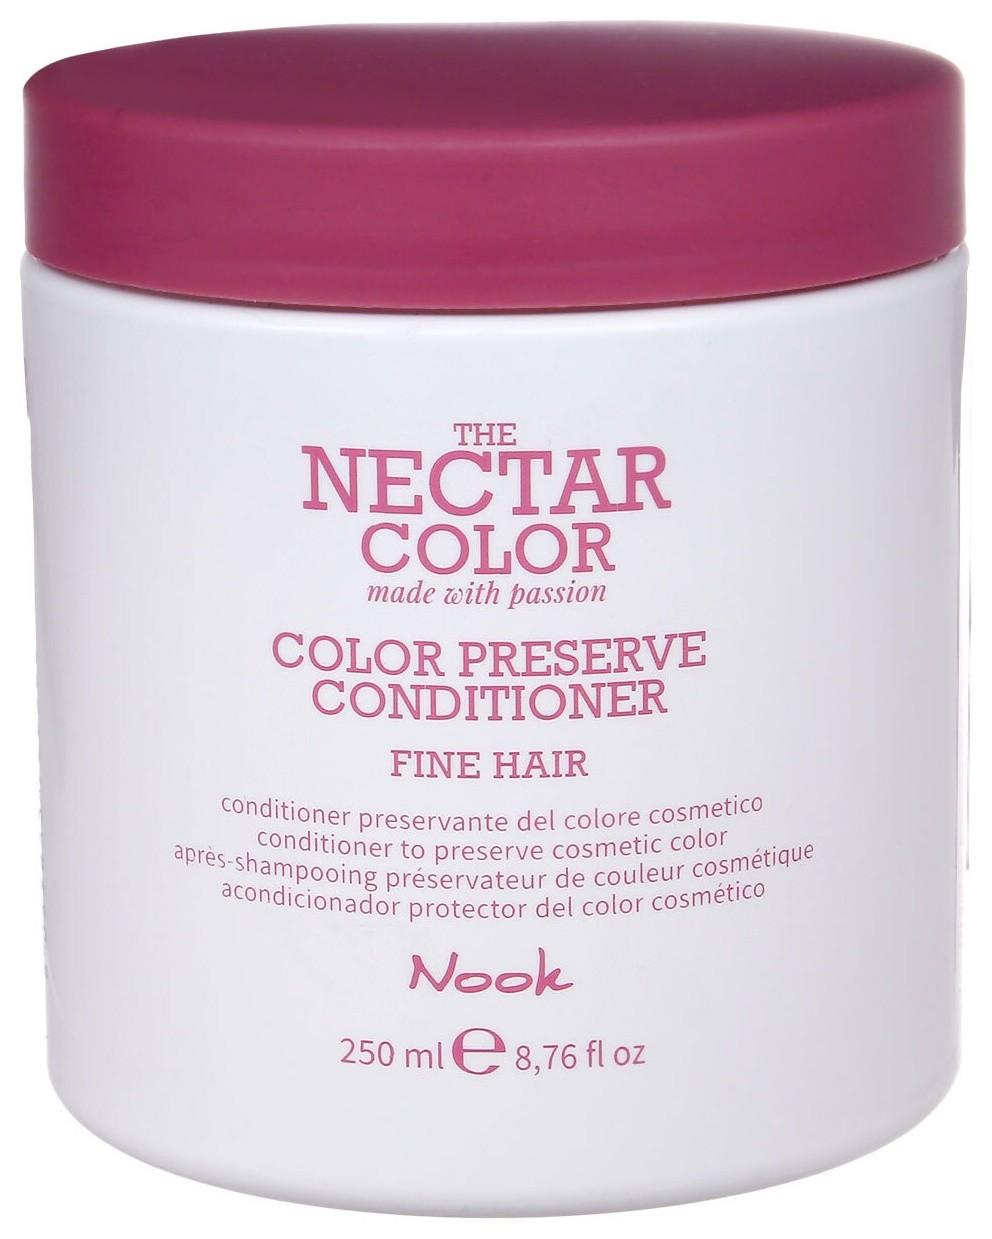 Кондиционер для ухода за тонкими окрашенными волосами Preserve Conditioner - Fine Hair to preserve cosmetic color  Nook